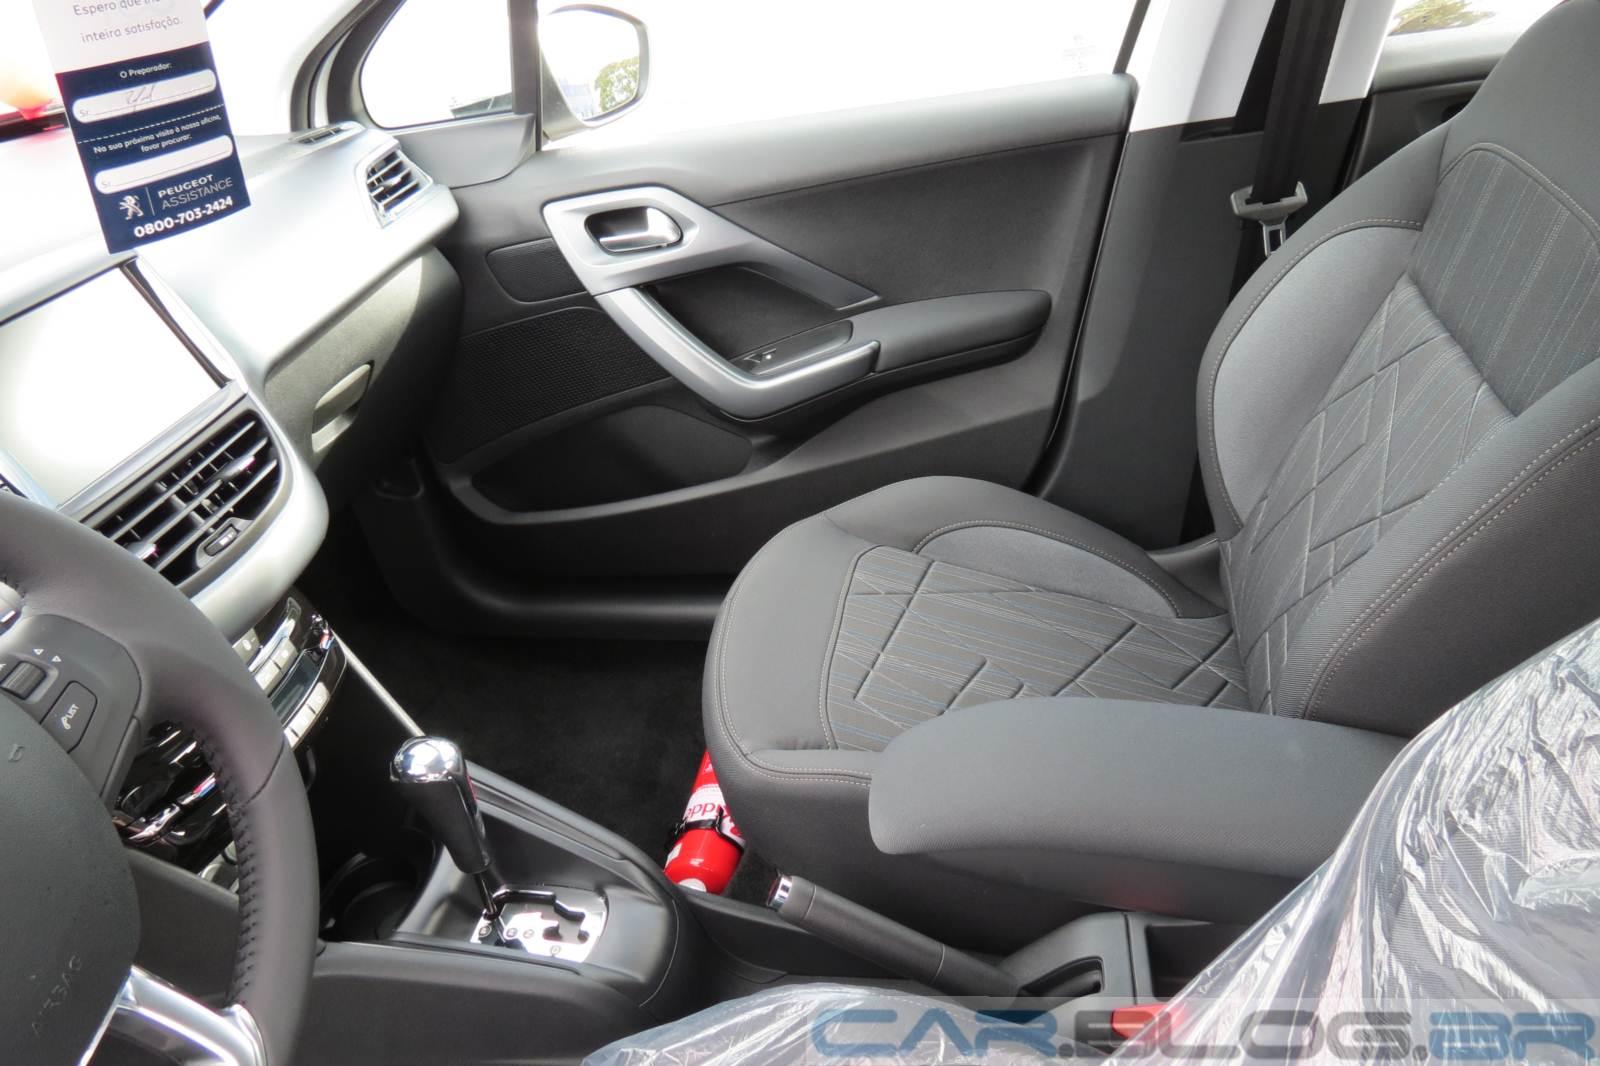 Peugeot 208 griffe autom tico fotos pre o consumo e for Interno peugeot 208